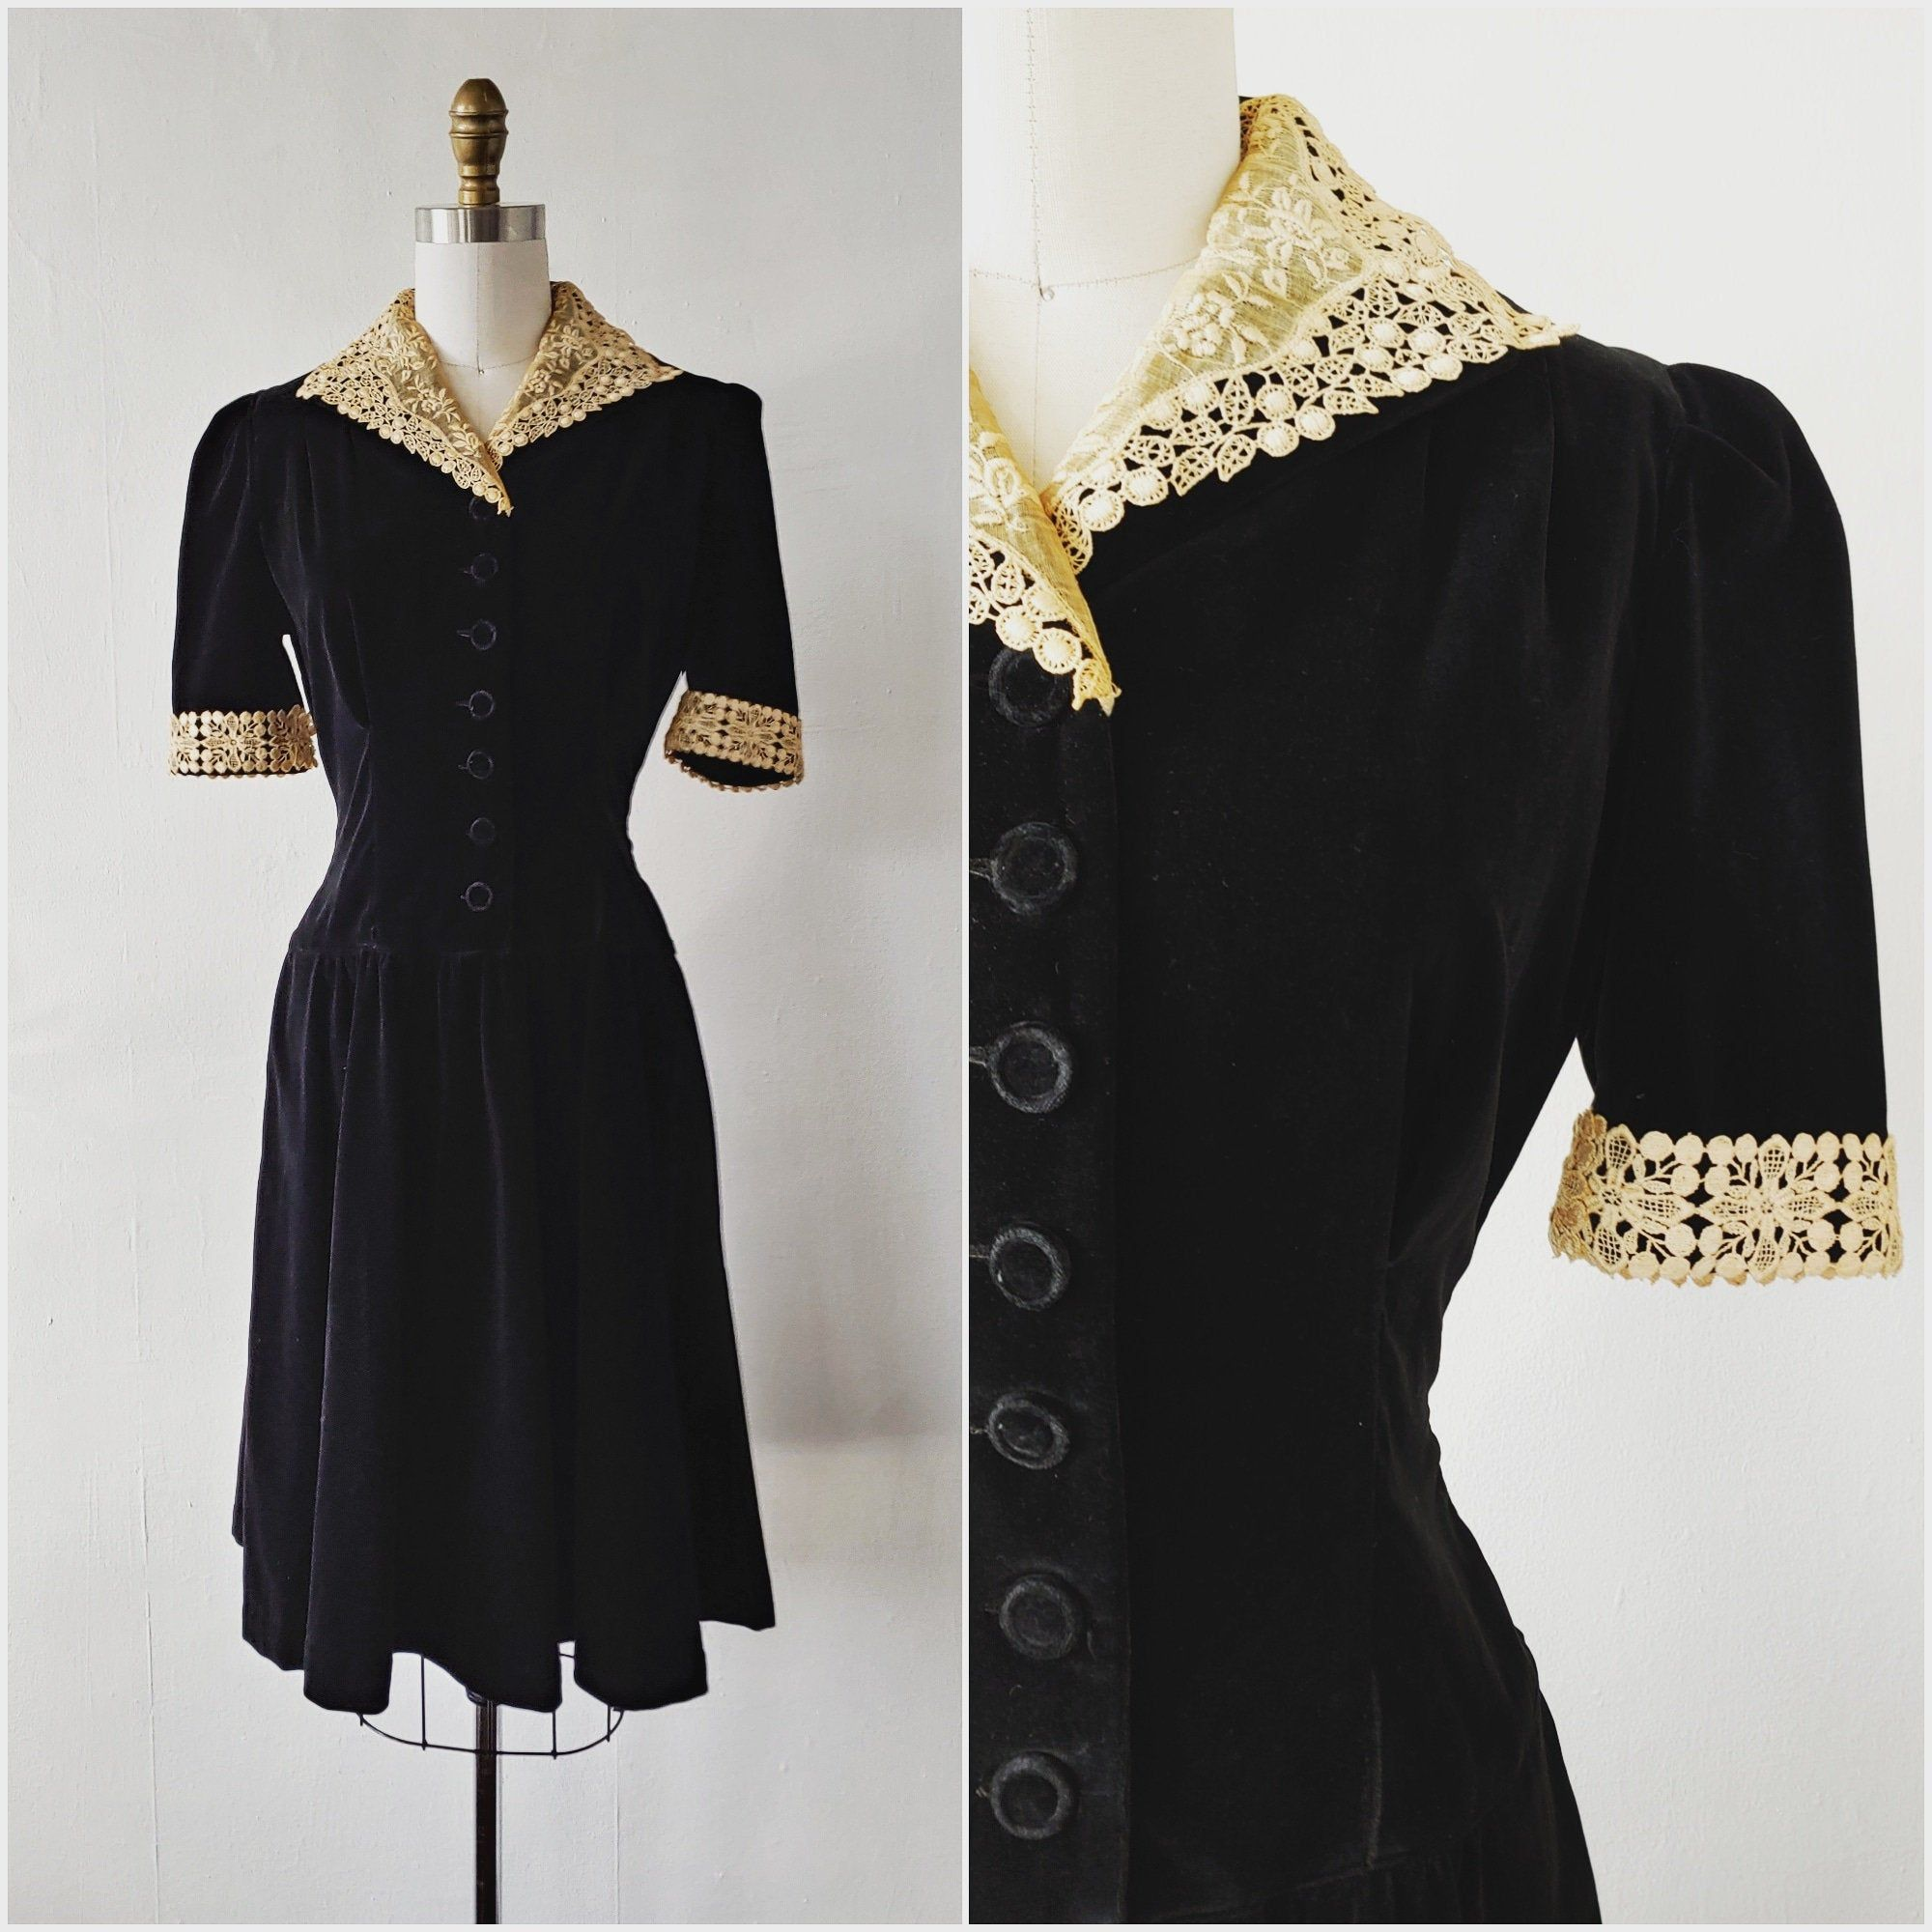 1930 Black Velvet Dress Vintage 1930s Black Velvet Dress With Ecru Lace Size Small Vintage Black Dress Black Velvet Dress Vintage Black Dress Evening Dresses Vintage [ 2000 x 2000 Pixel ]